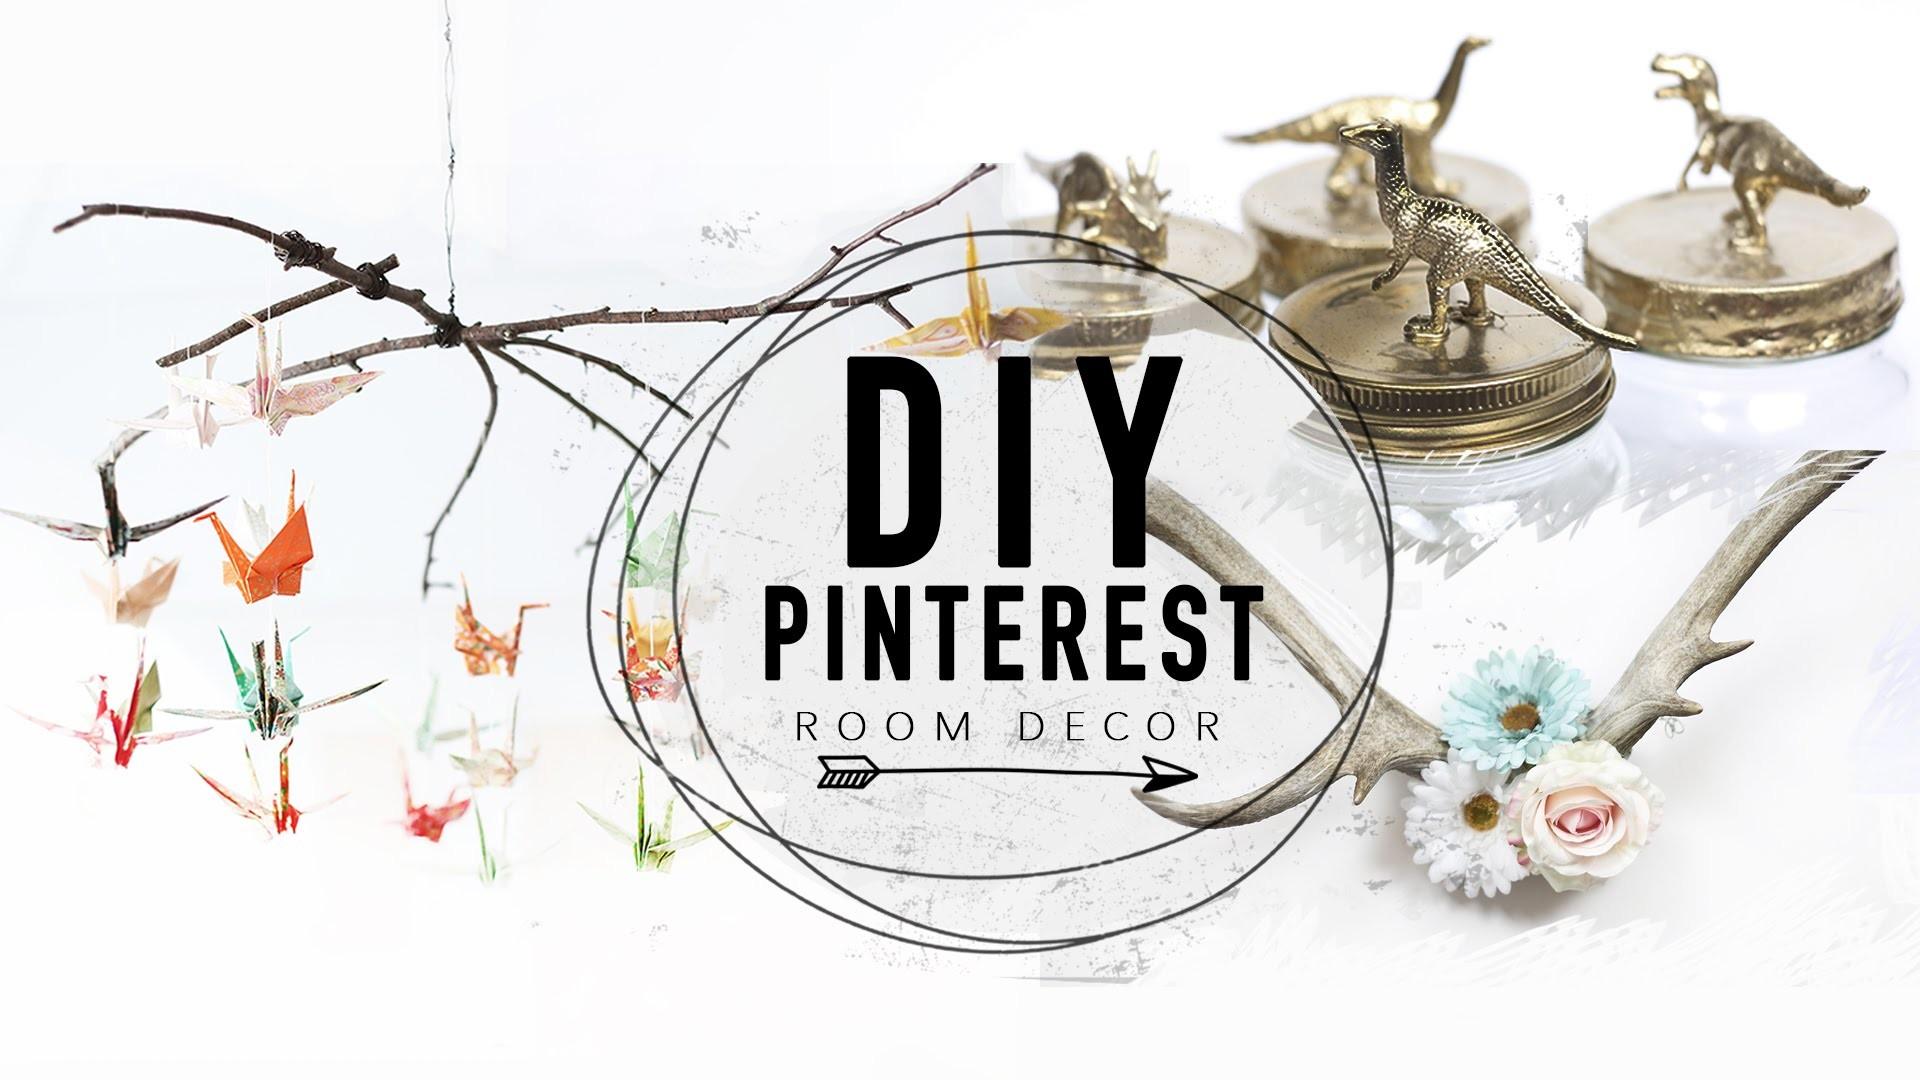 DIY Pinterest Inspired Room Decor Ideas! - 4 Easy & Cheap DIYS